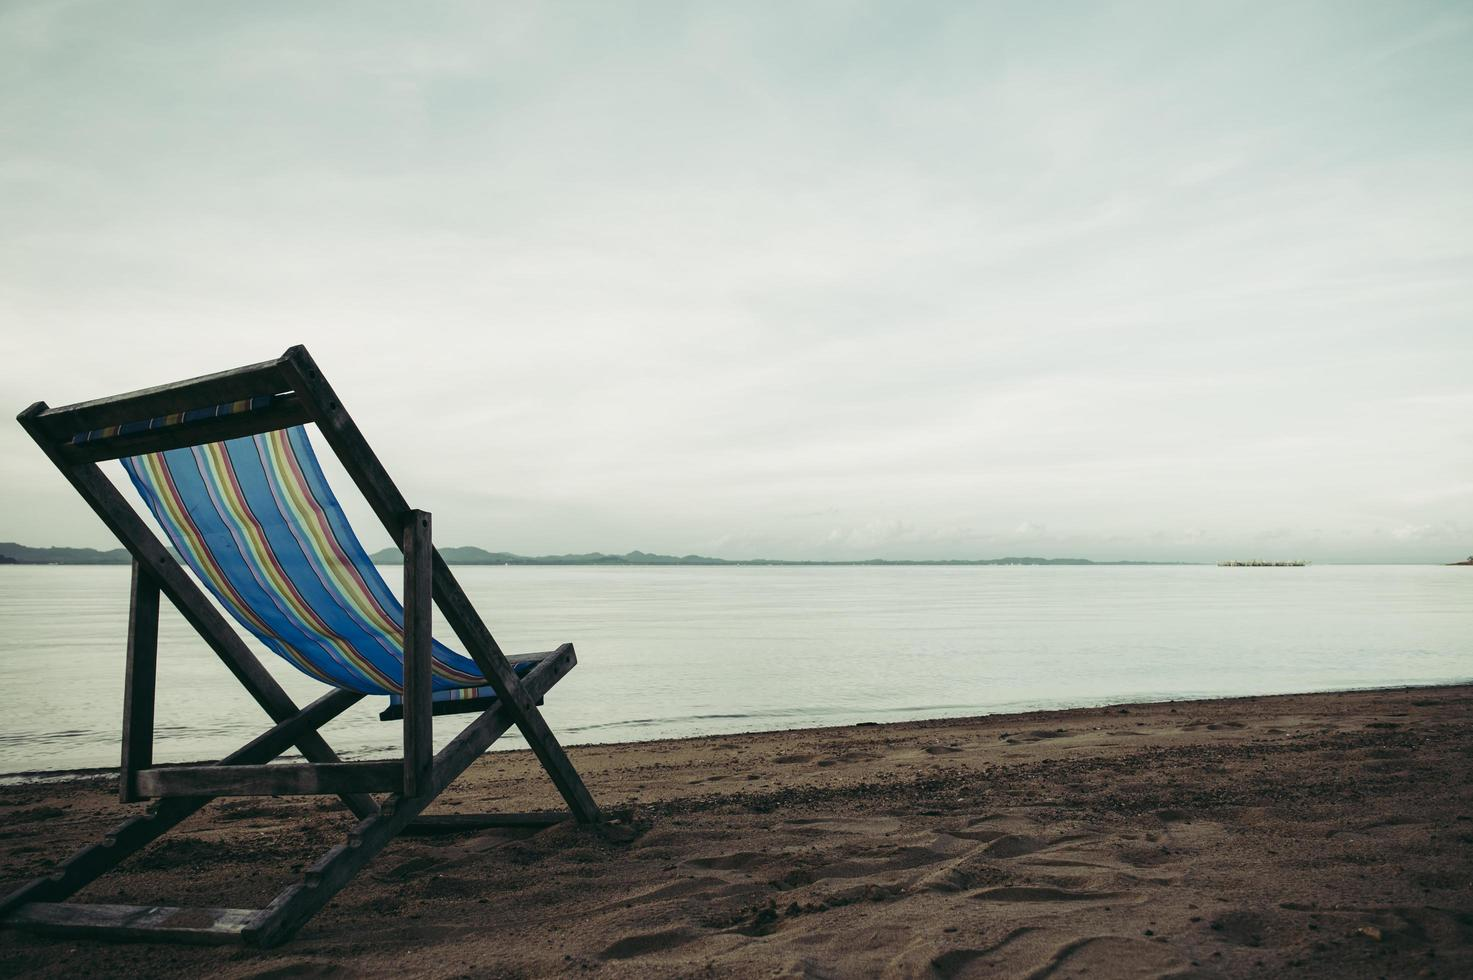 Meer mit Resort Liegestühlen foto